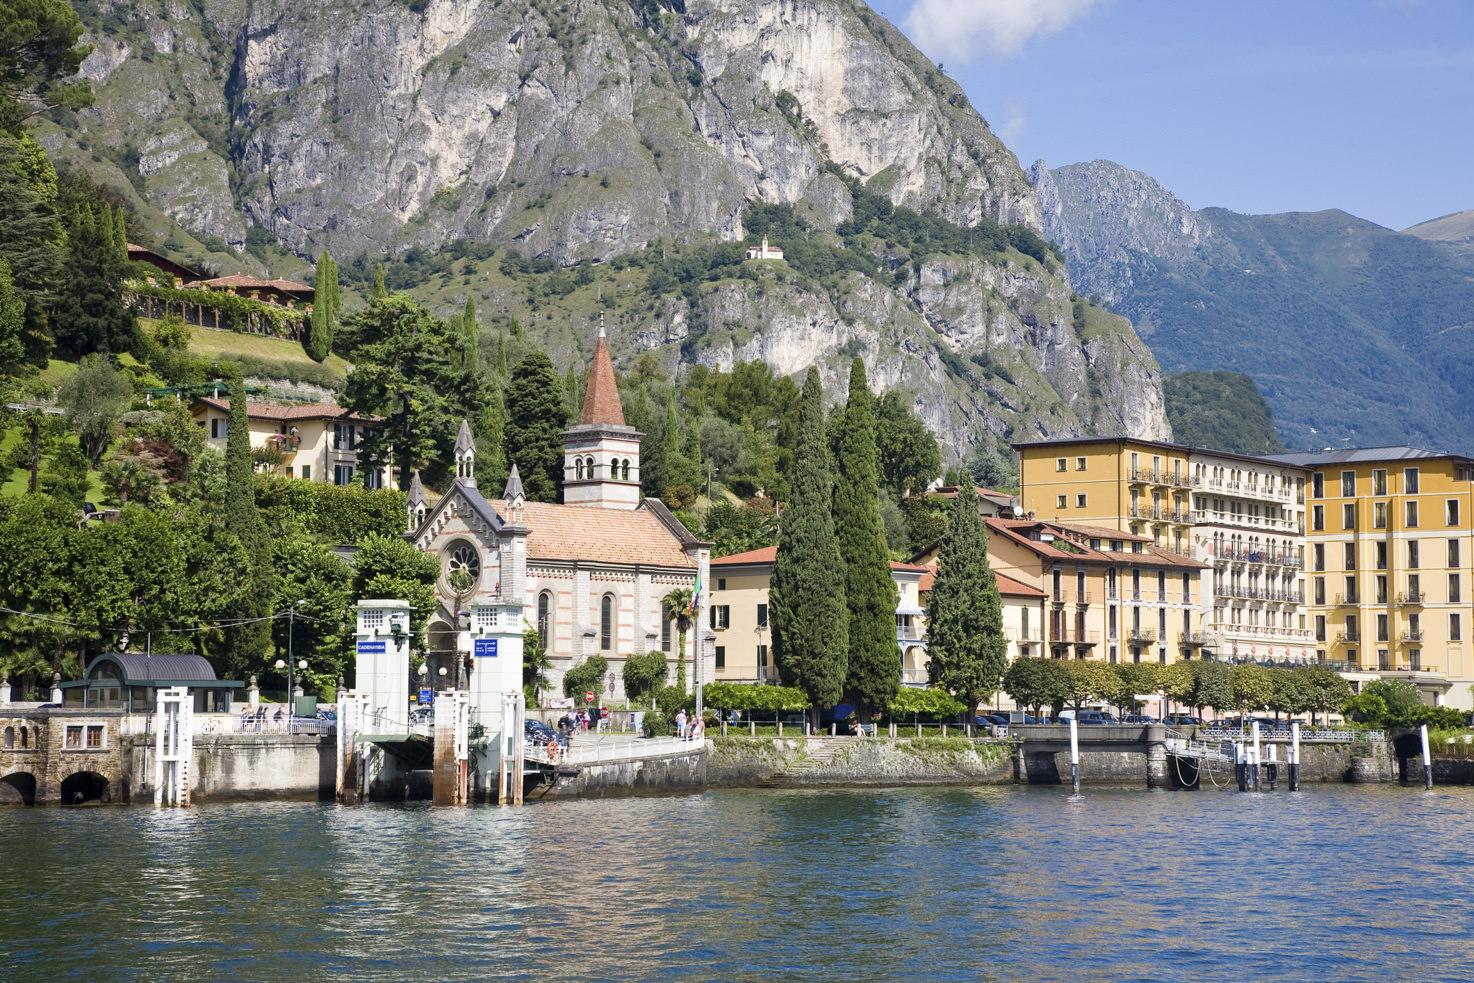 Protestant church for Lake Como weddings